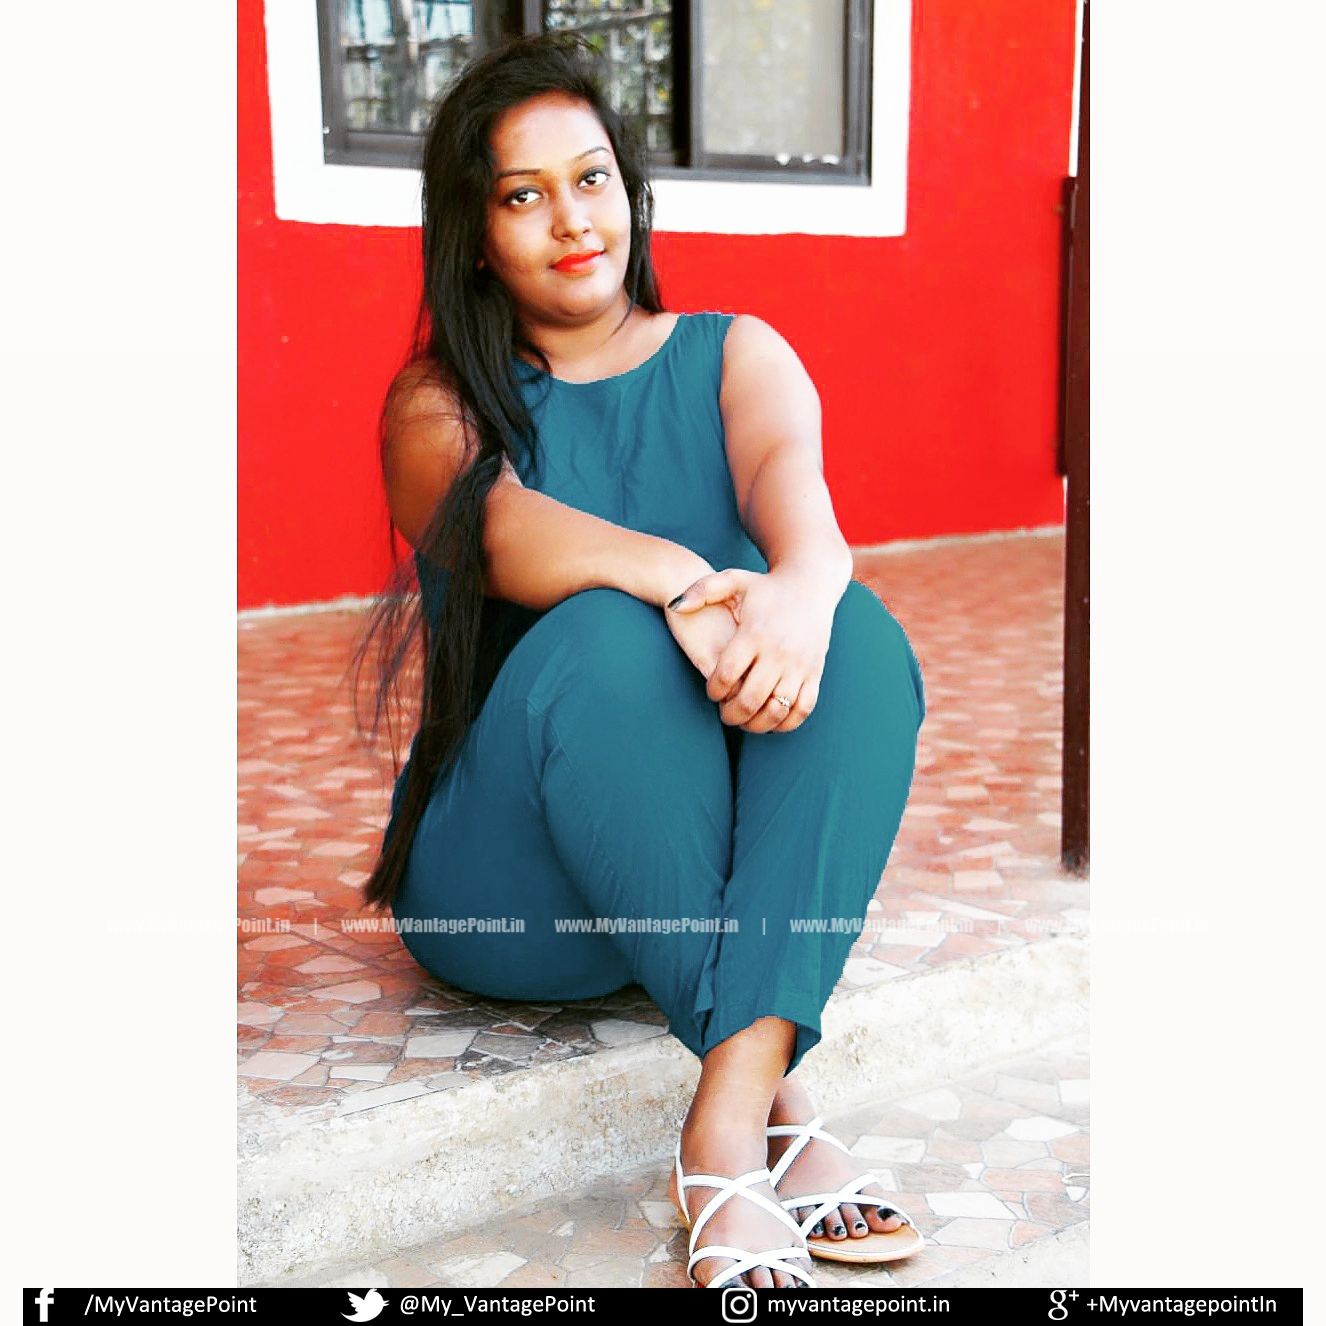 Agnessa Raman in jump suite, Agnessa Raman thunder thighs, Agnessa Raman hot legs